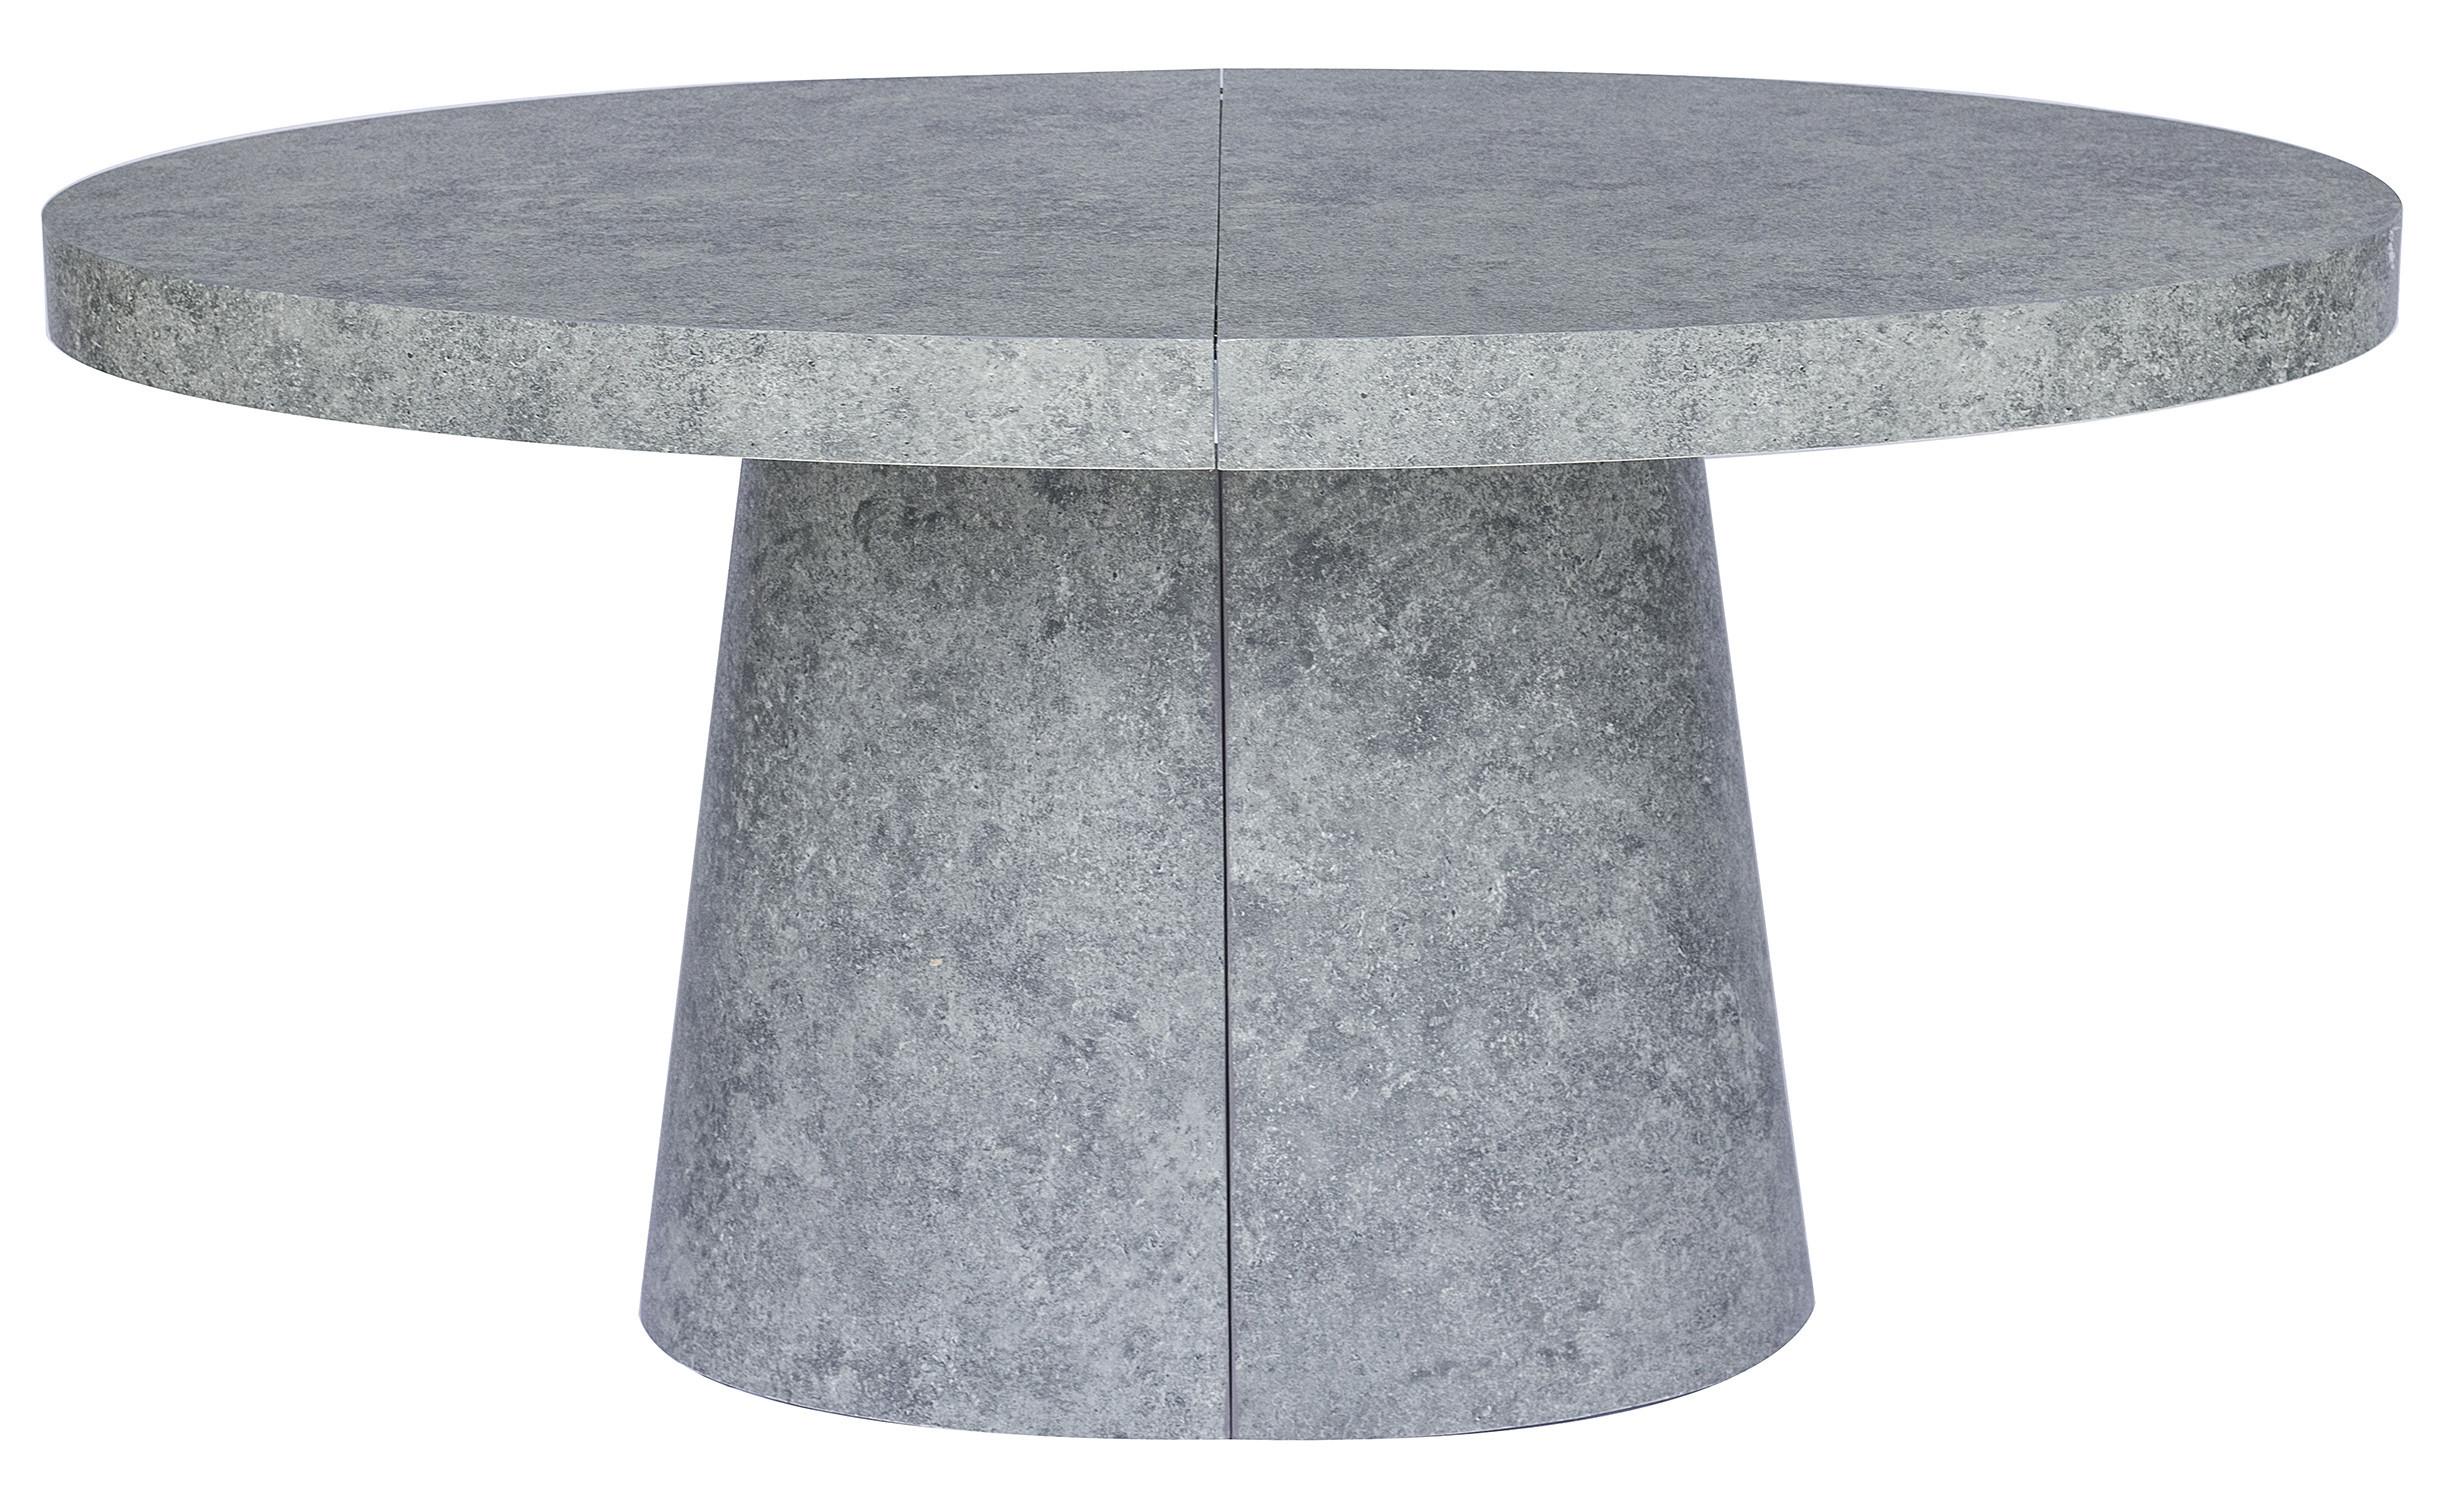 "Table À Manger Ovale Extensible Bois Effet Béton Aleez Intended For 2018 Mode 72"" L Breakroom Tables (View 11 of 15)"